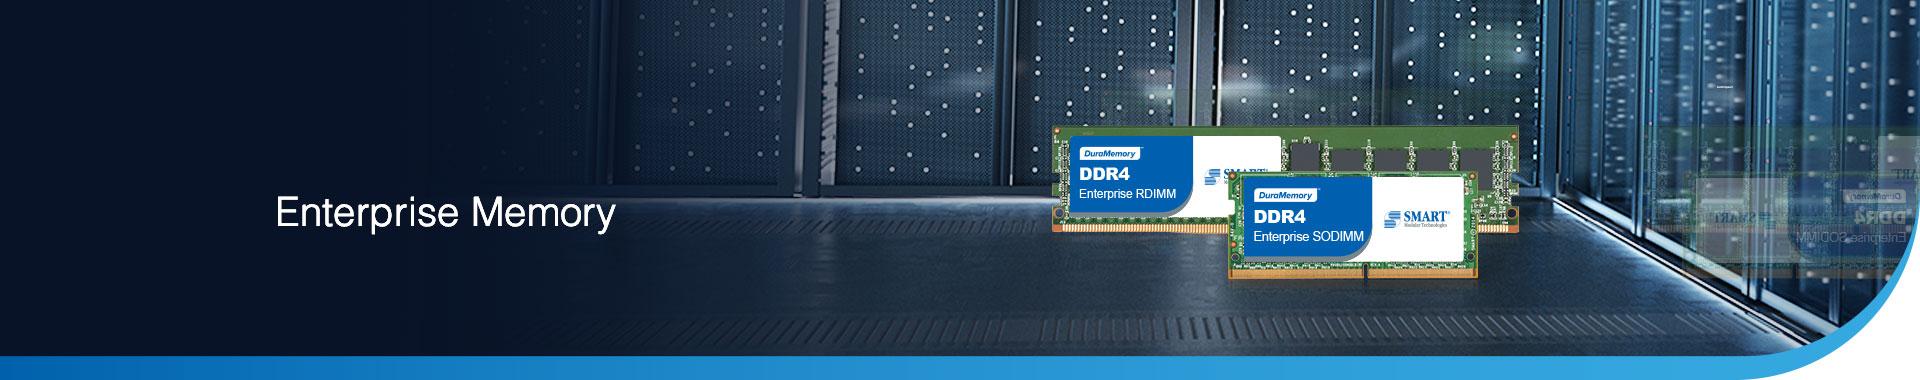 SMART_DRAM_Module_Enterprise_Memory